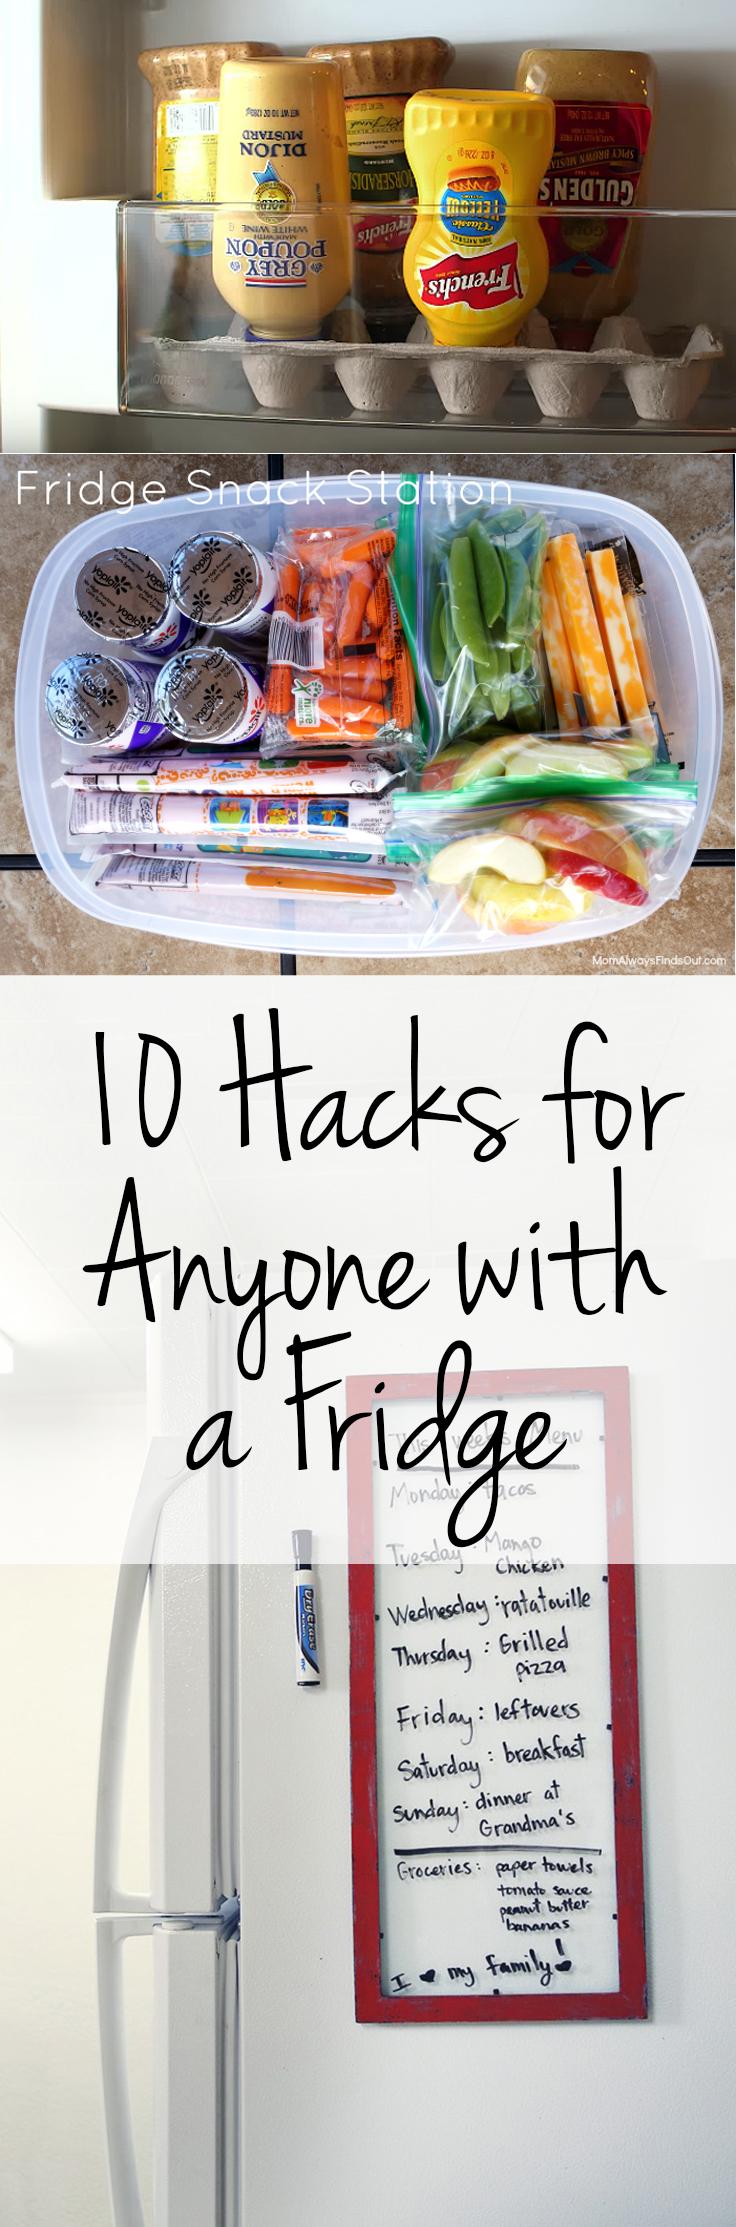 Organization, Home Organization, Fridge Hacks, Popular Pin, Cleaning TIps and Tricks, Kitchen, Kitchen Storage, Kitchen Hacks, Cooking Hacks